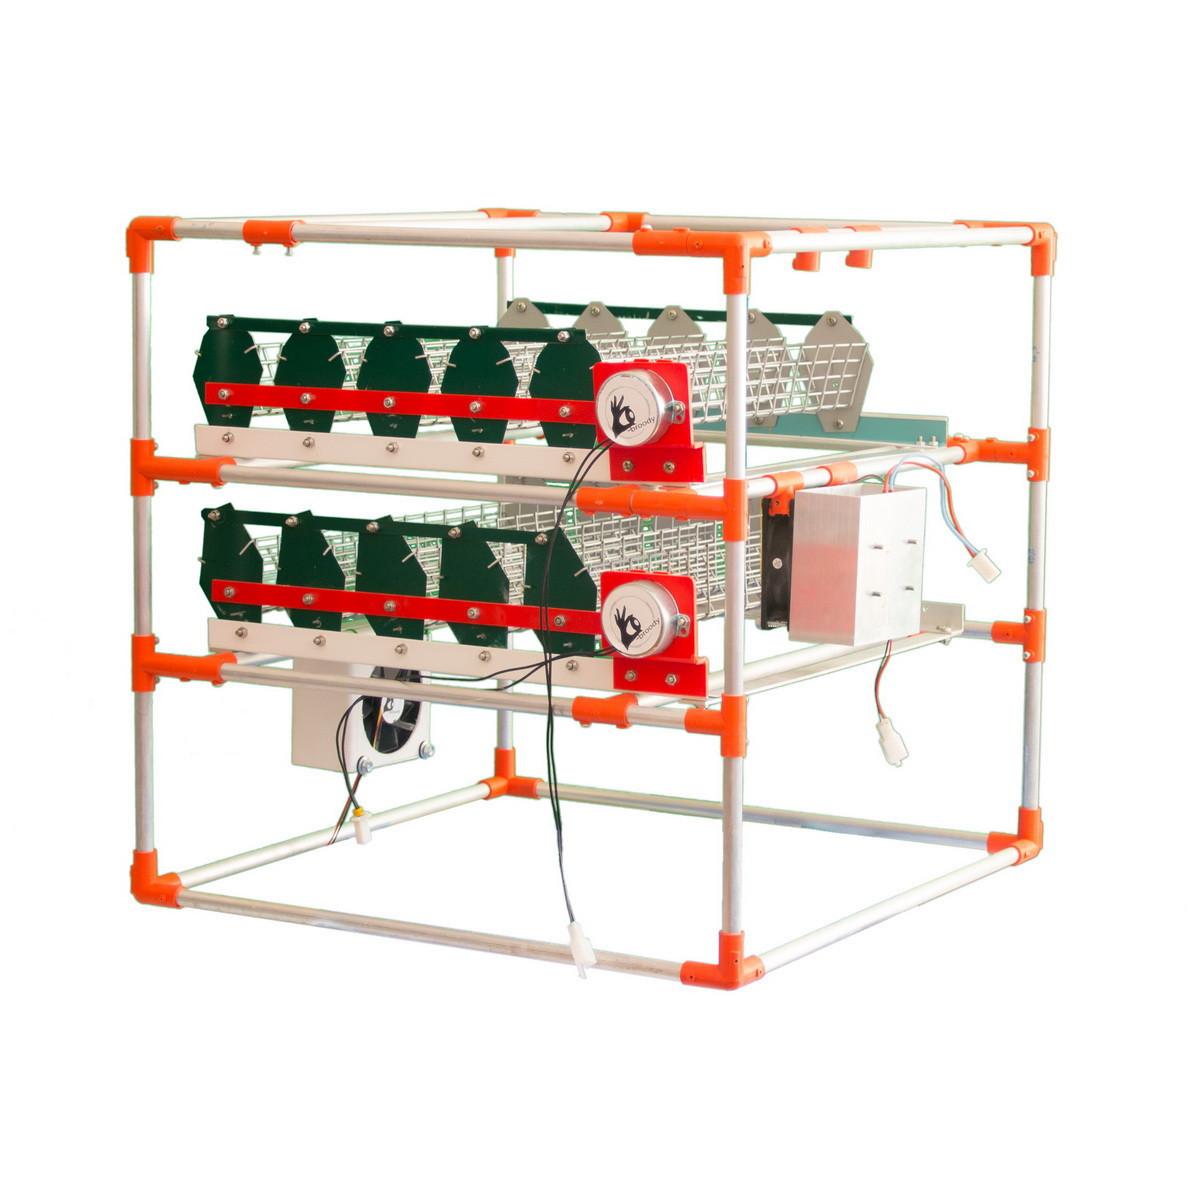 Автоматический инкубатор-конструктор (220V) на 90 яиц, с увлажнителем - фото 2